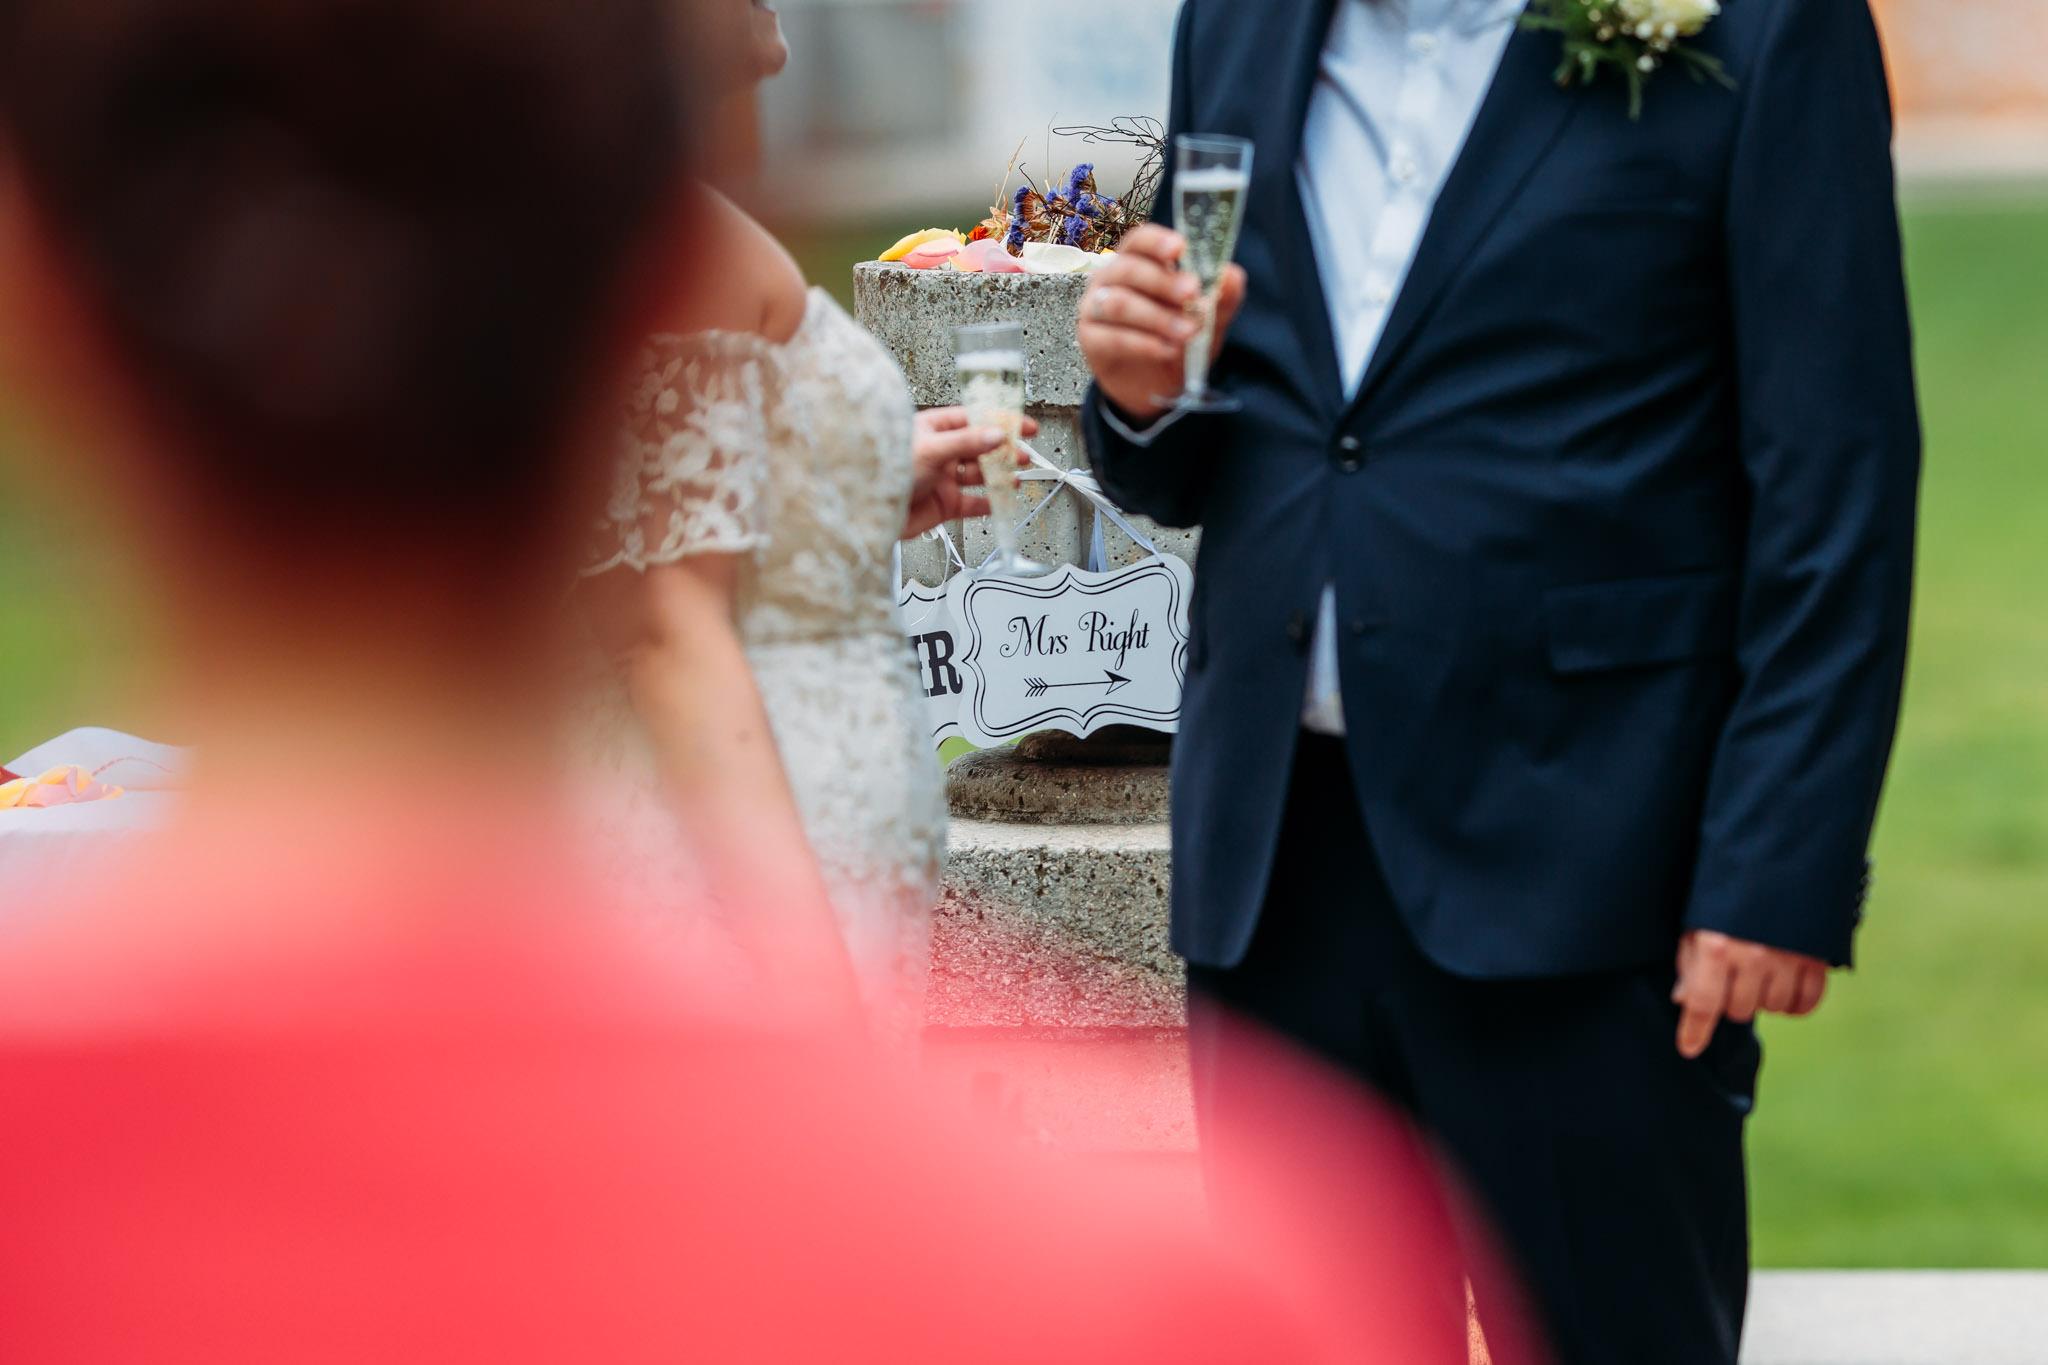 180825_Hochzeit_Berlin_Wannsee_Almhuette_Loretta_web_0007.jpg